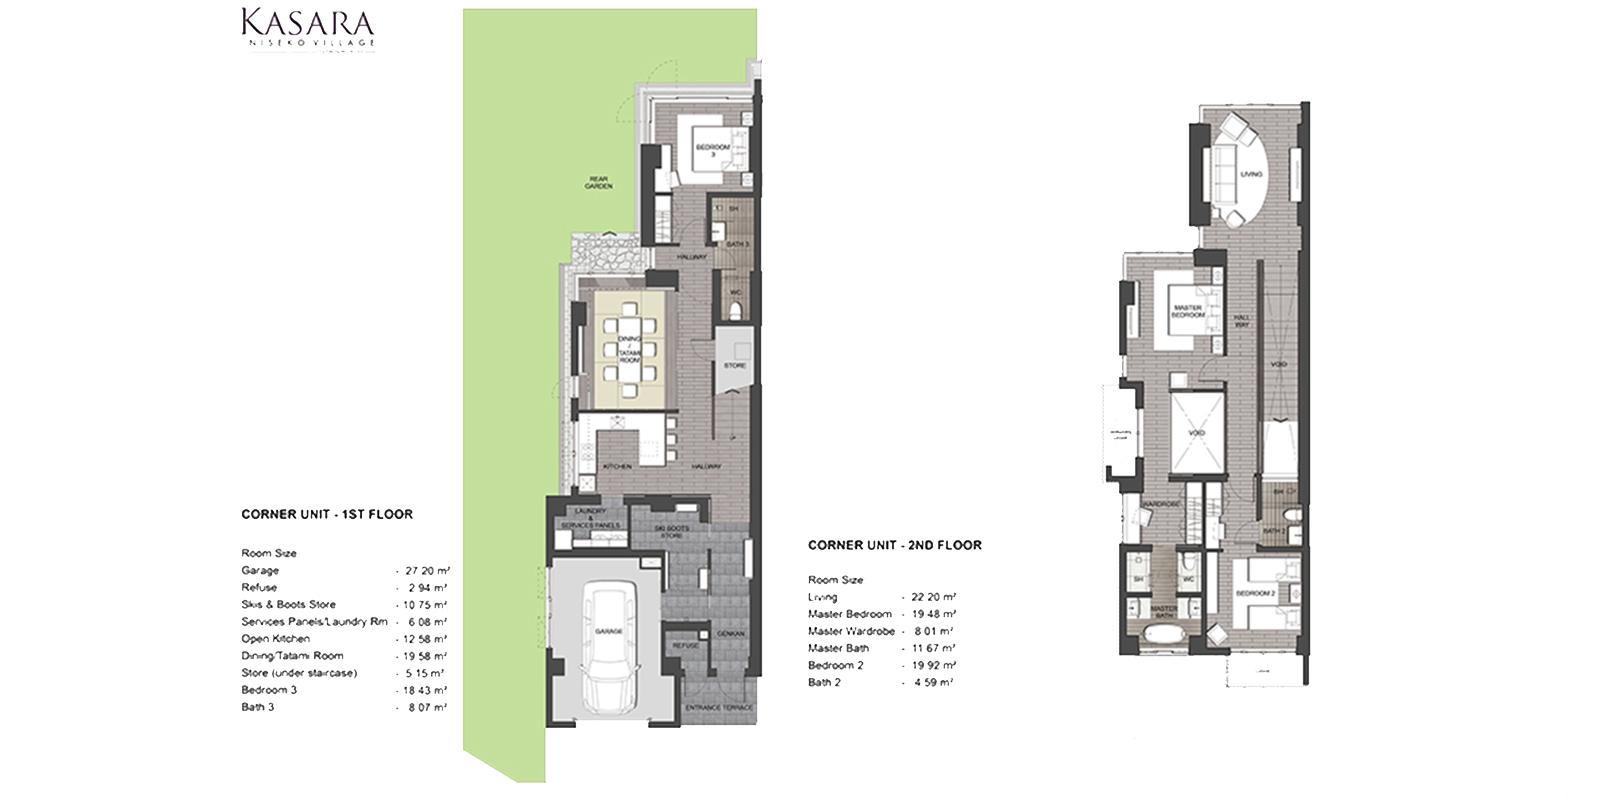 Kasara Townhouses Floor Plan | Annupuri, Niseko